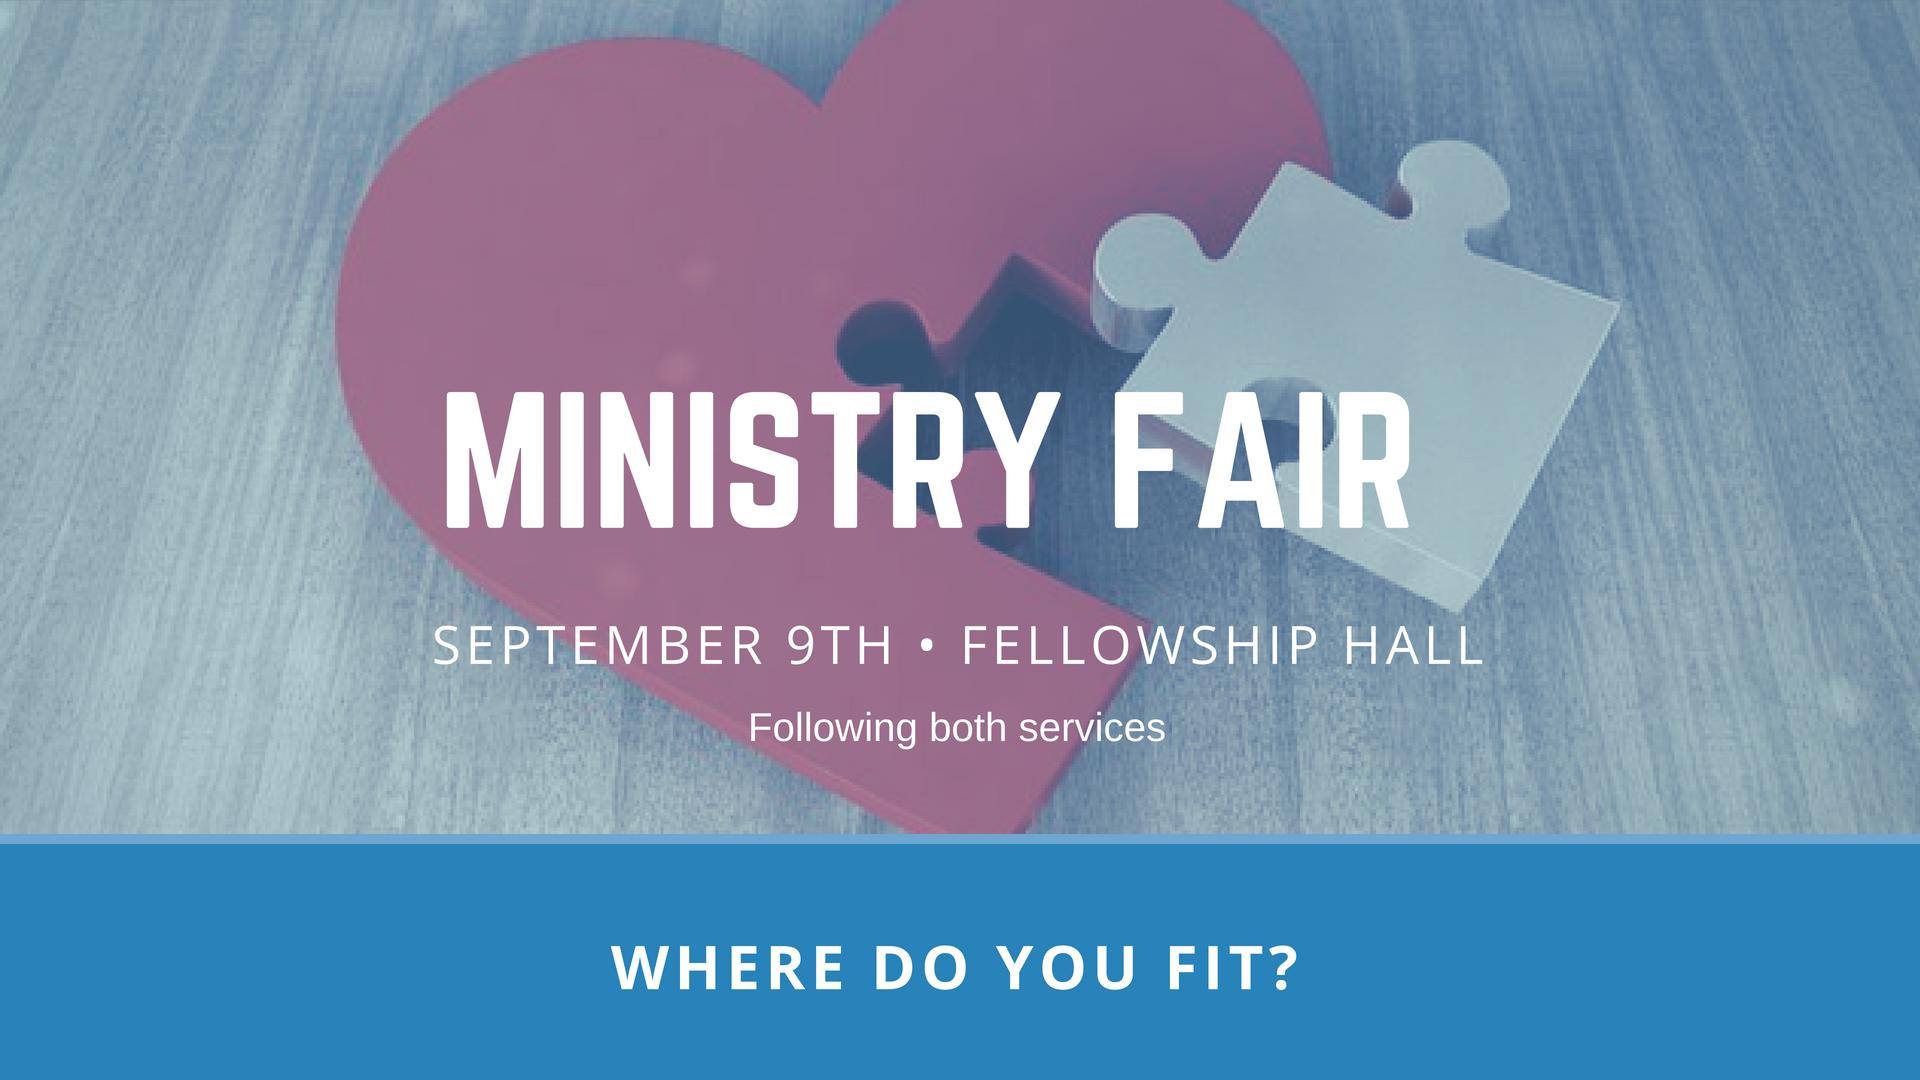 Ministry Fair (1).jpg